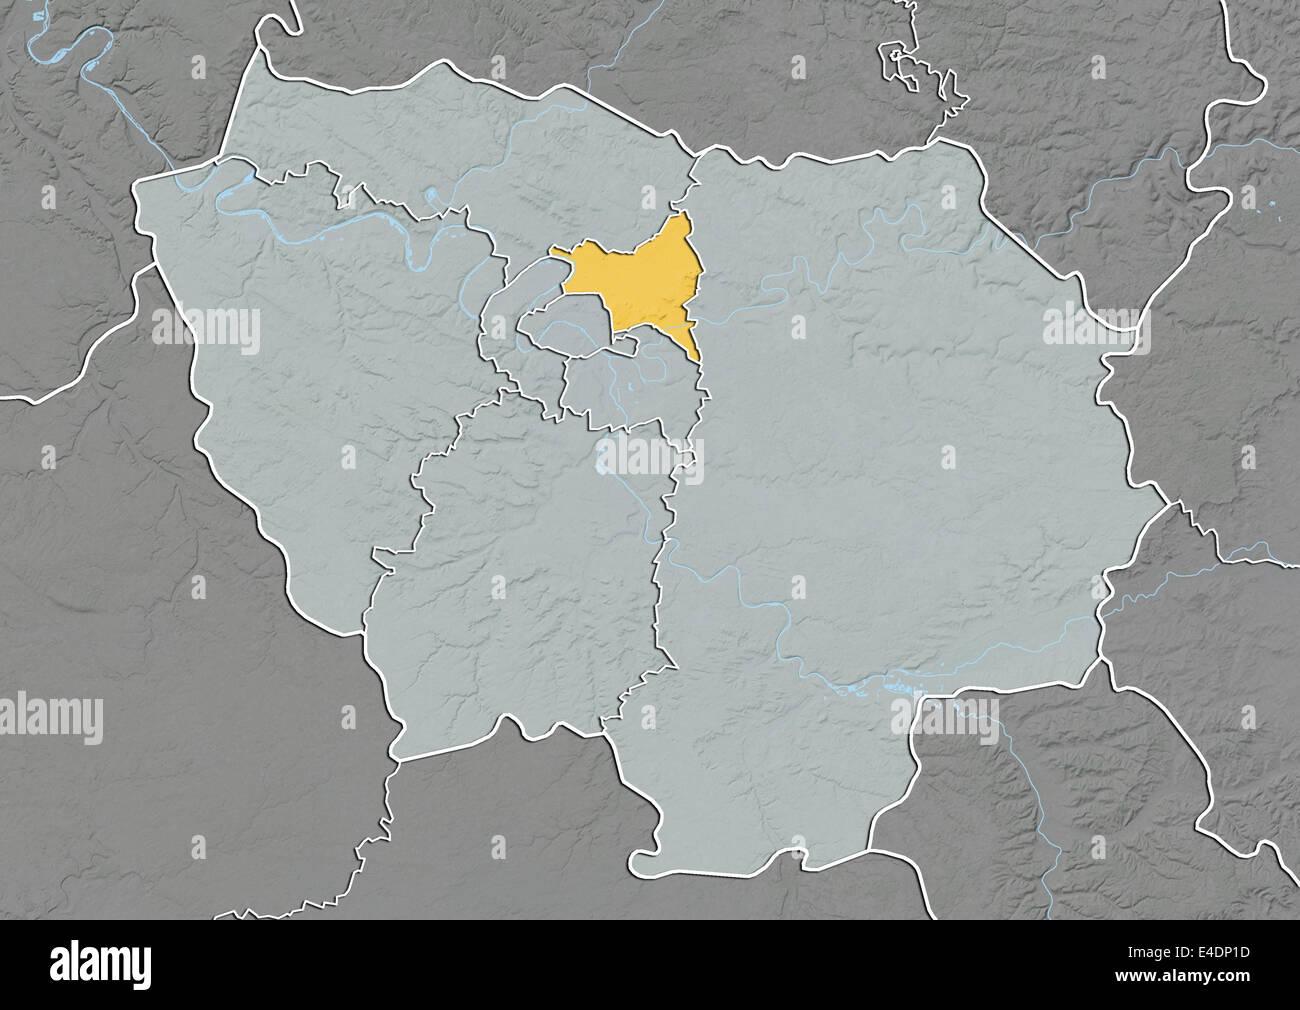 Saint Denis France Map.Departement Of Seine Saint Denis France Relief Map Stock Photo